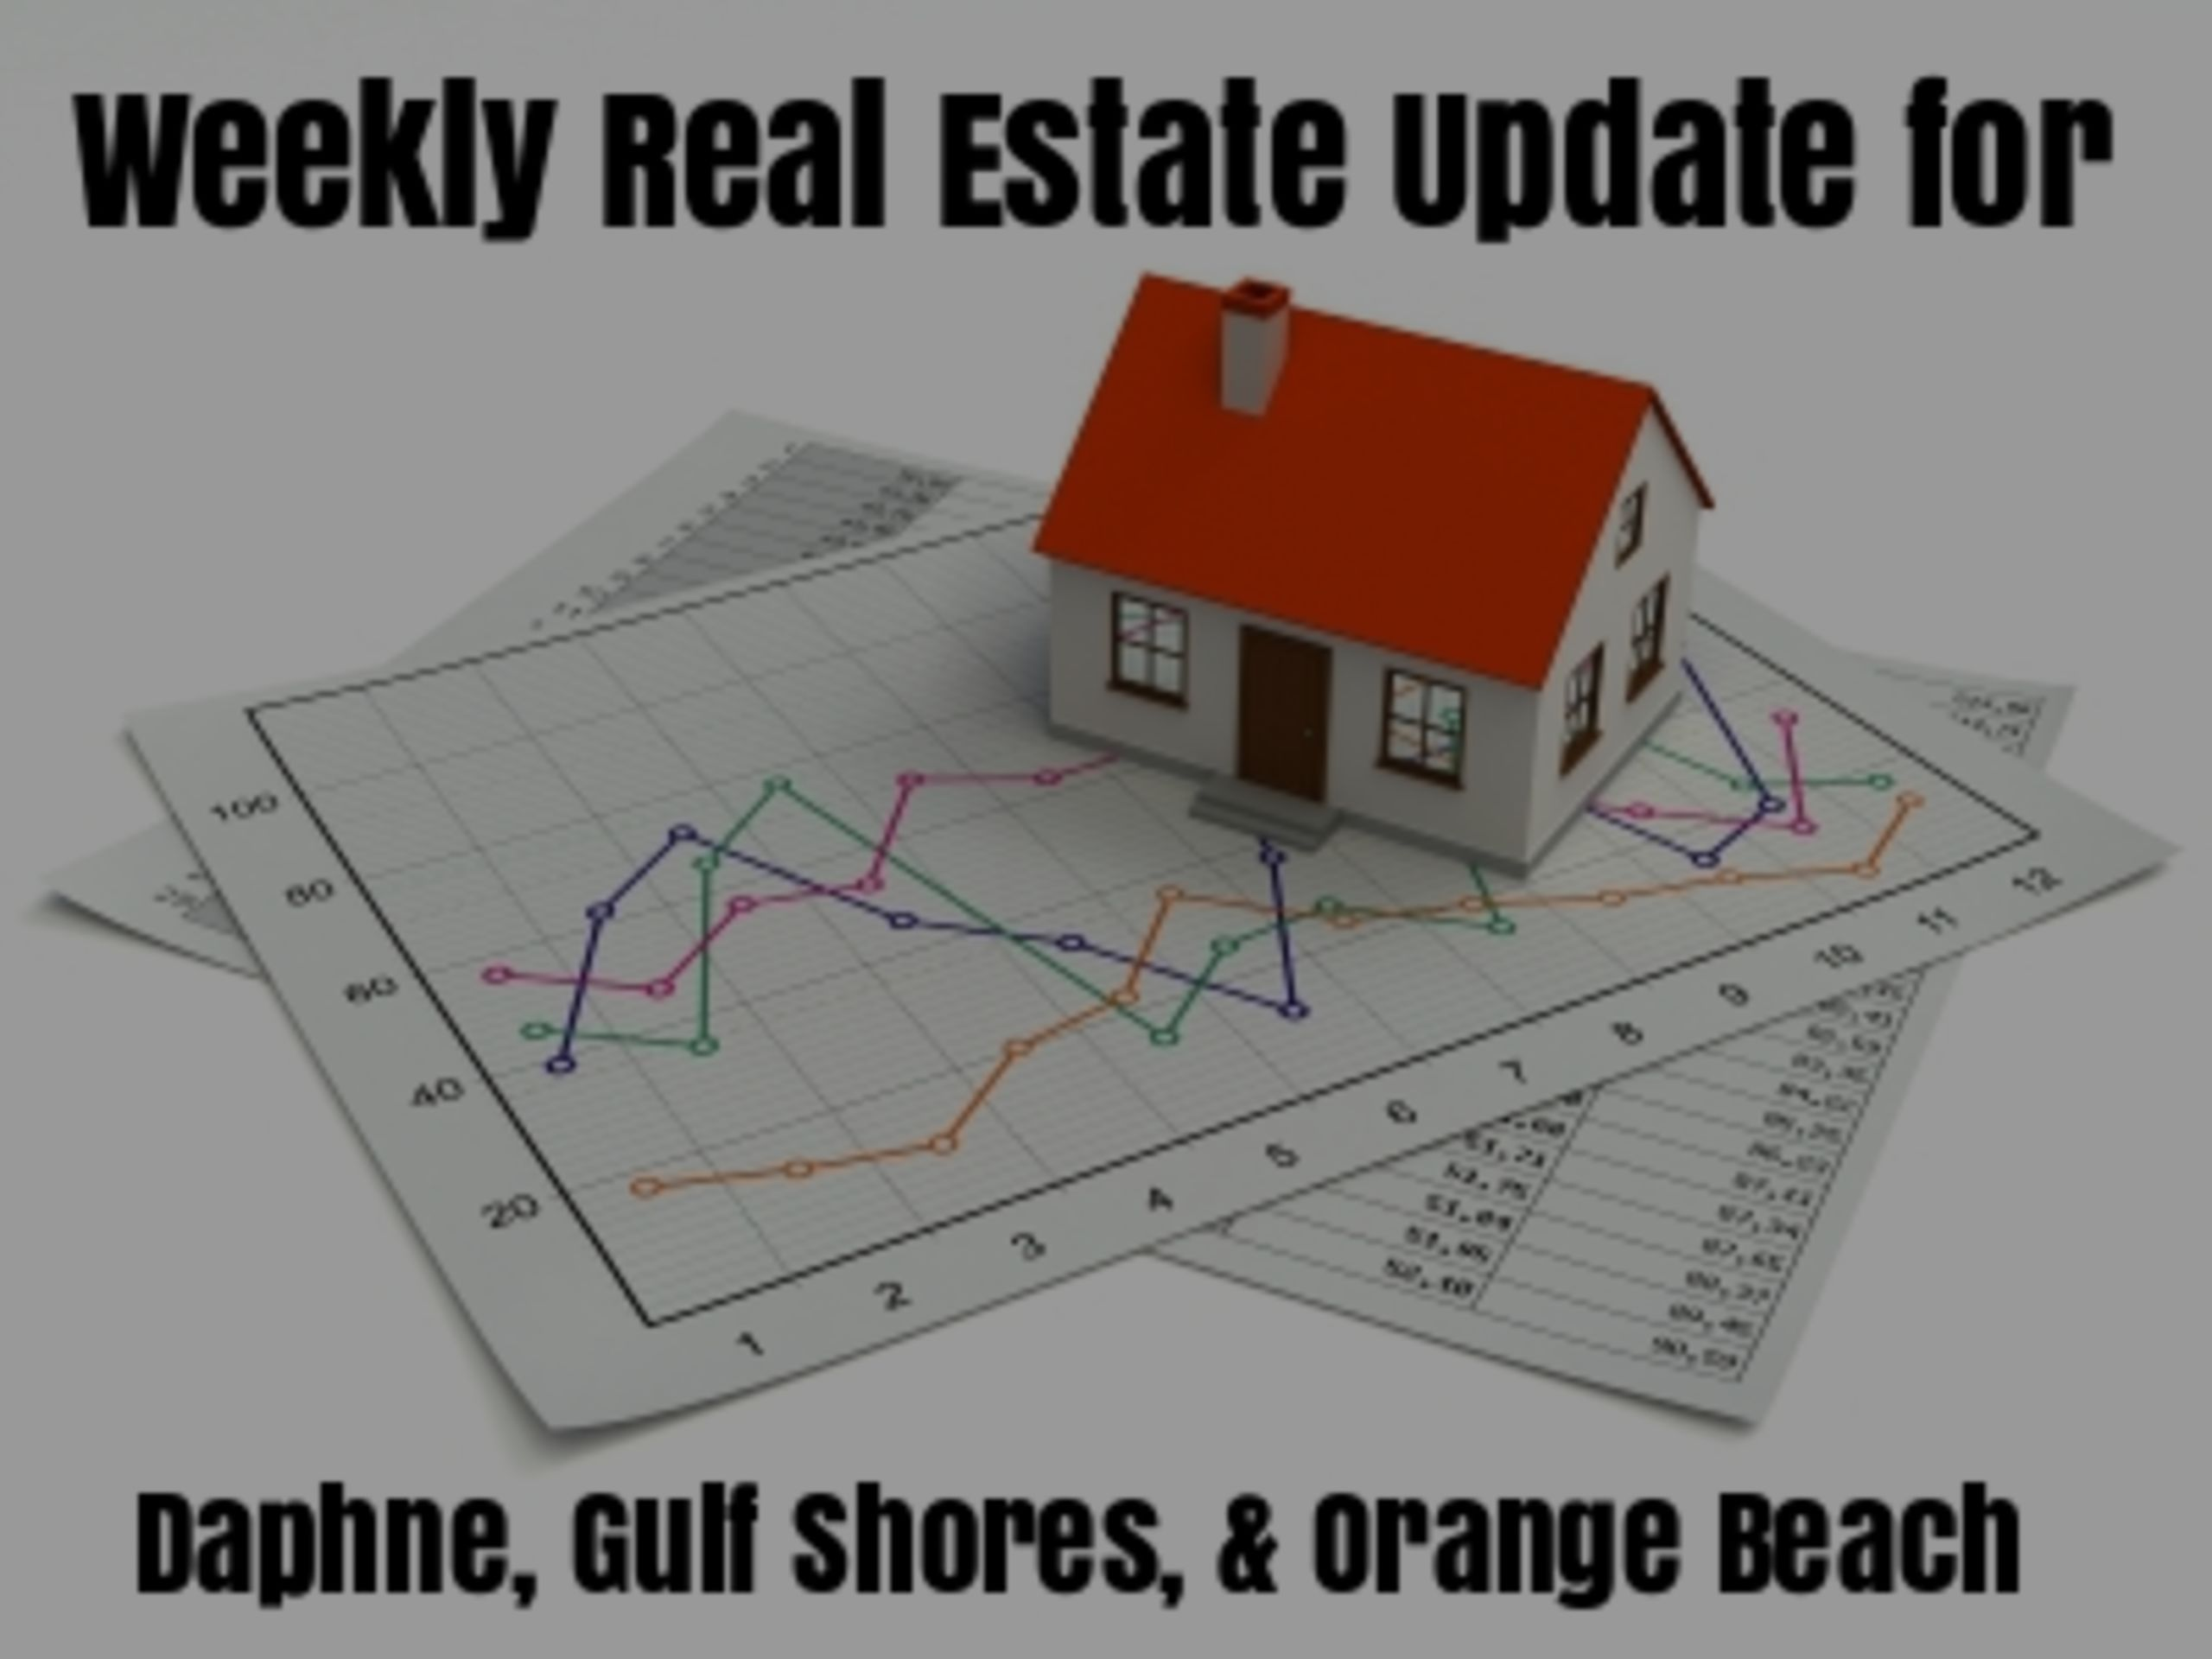 Weekly Real Estate Update – Daphne, Gulf Shores, and Orange Beach – 2/13/17